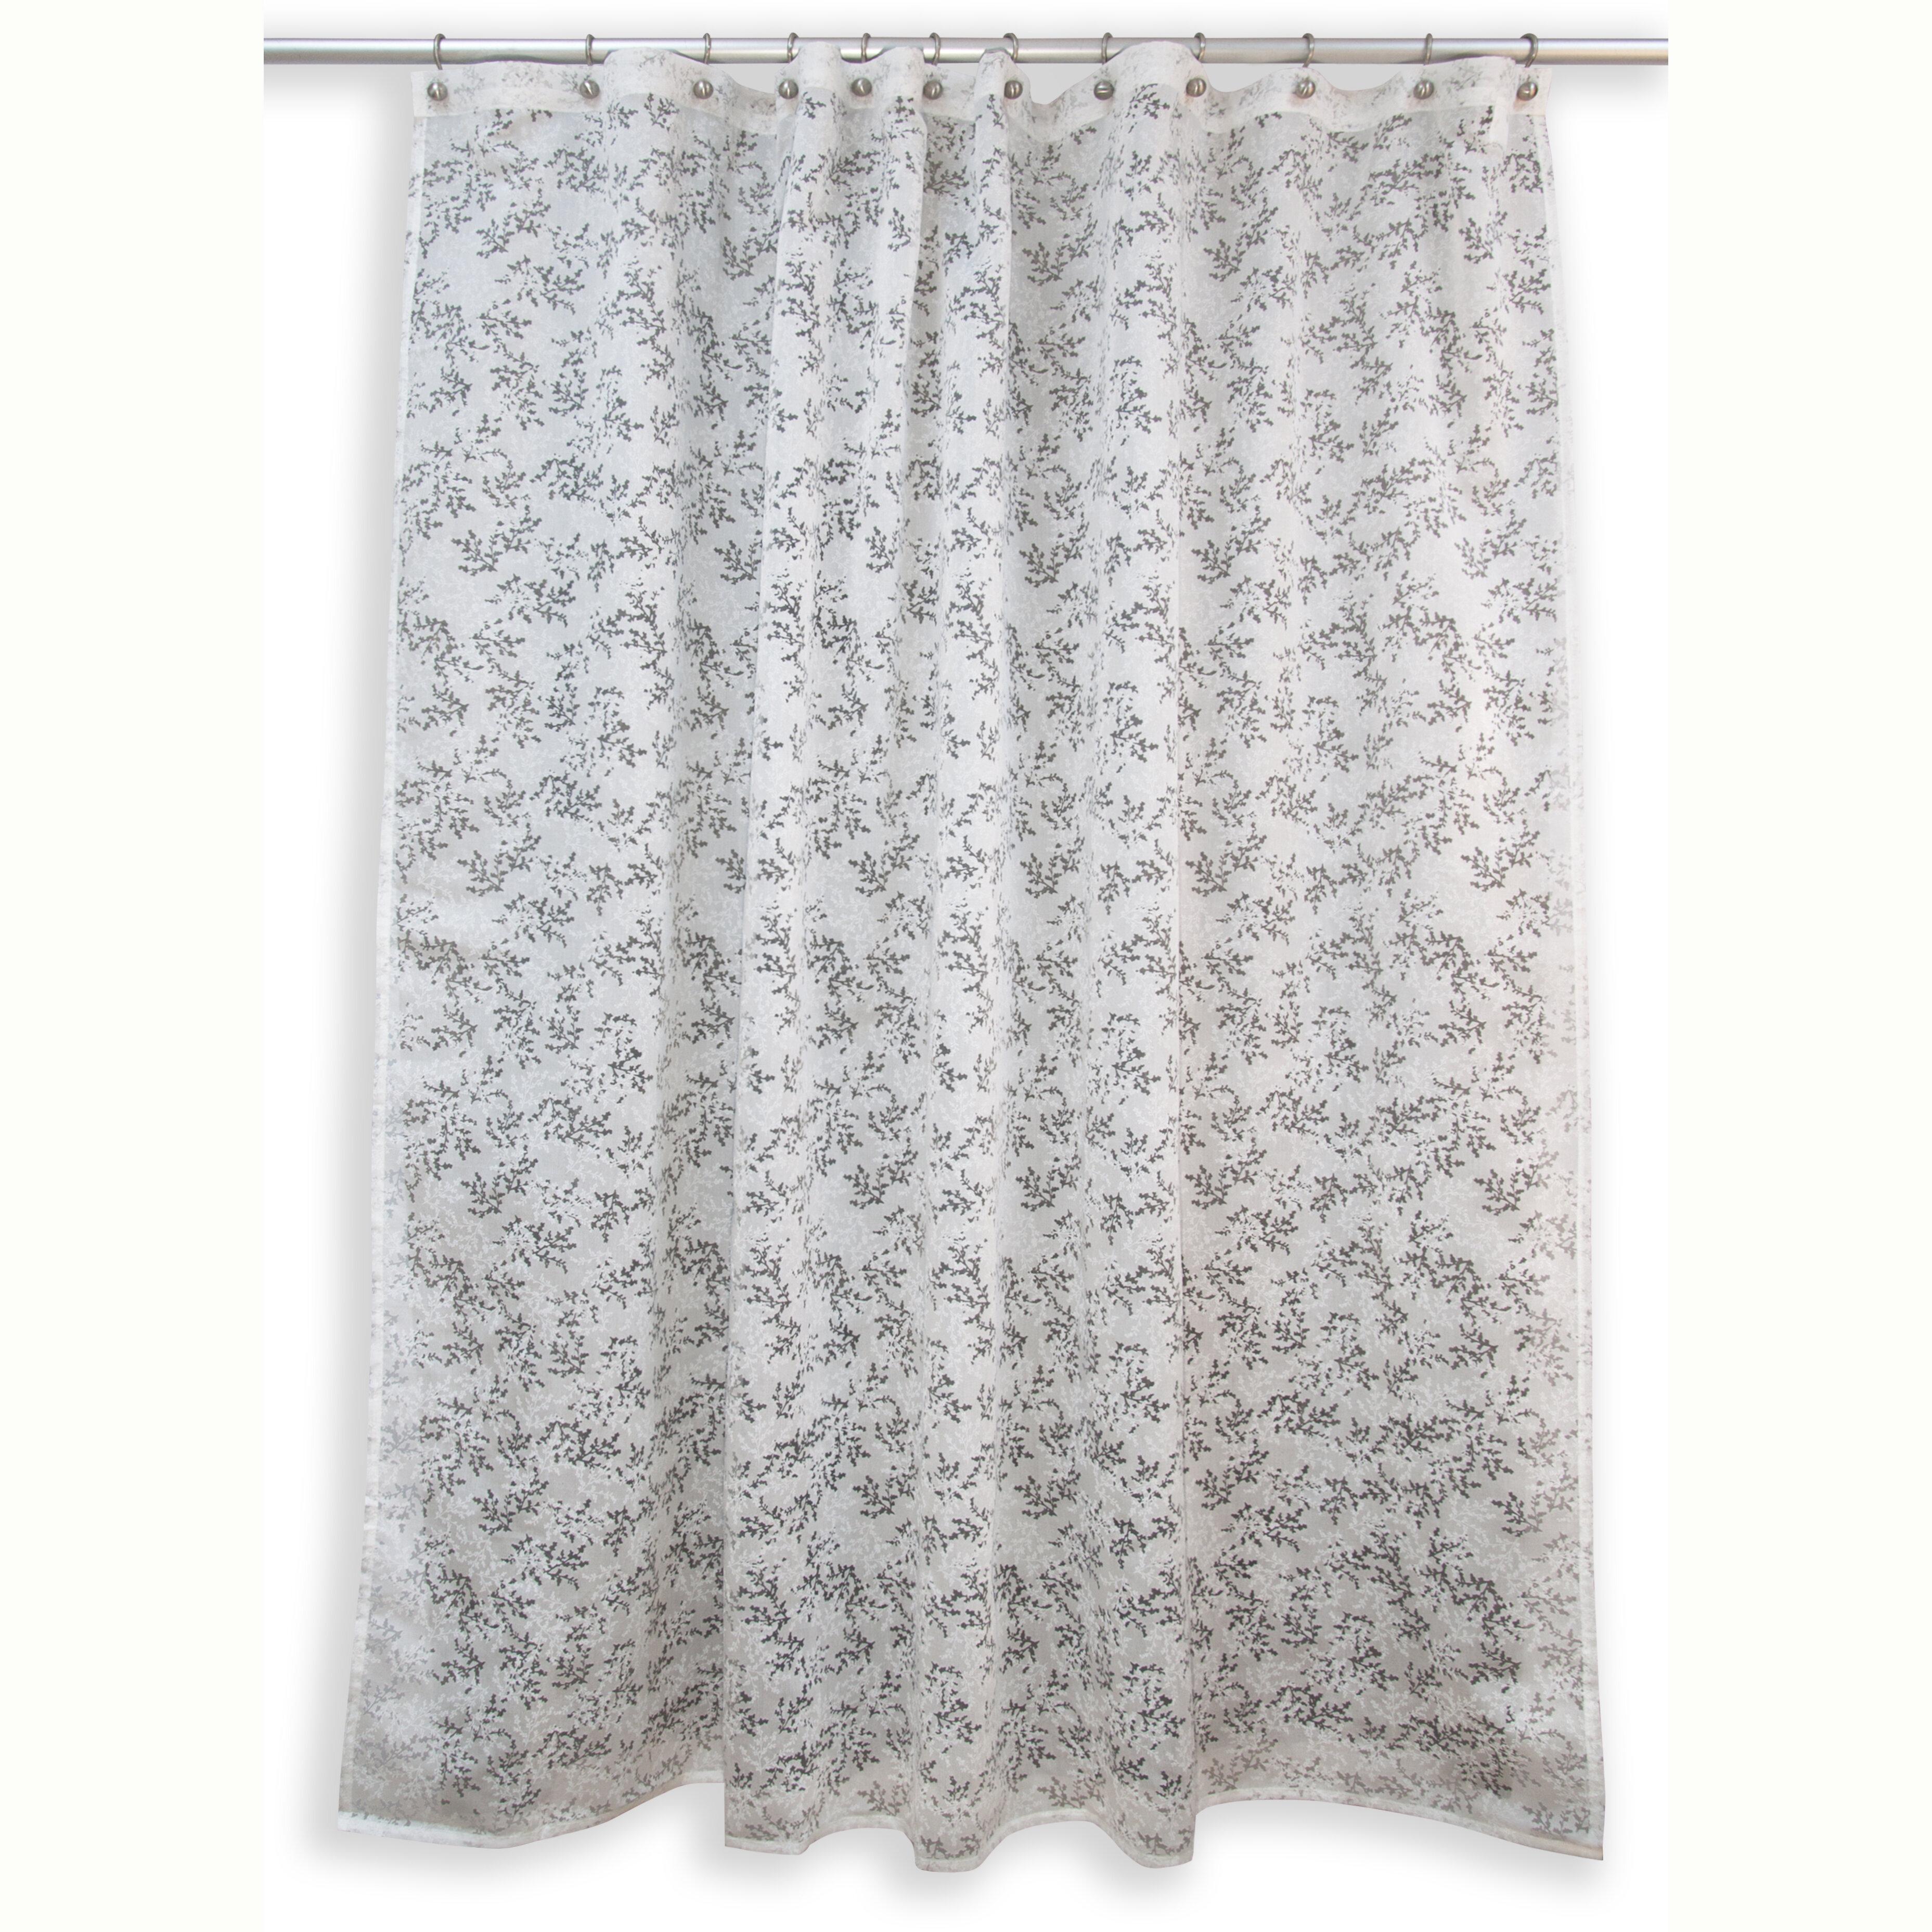 Comfort Bay Textured Fabric Shower Curtian Chiara Home